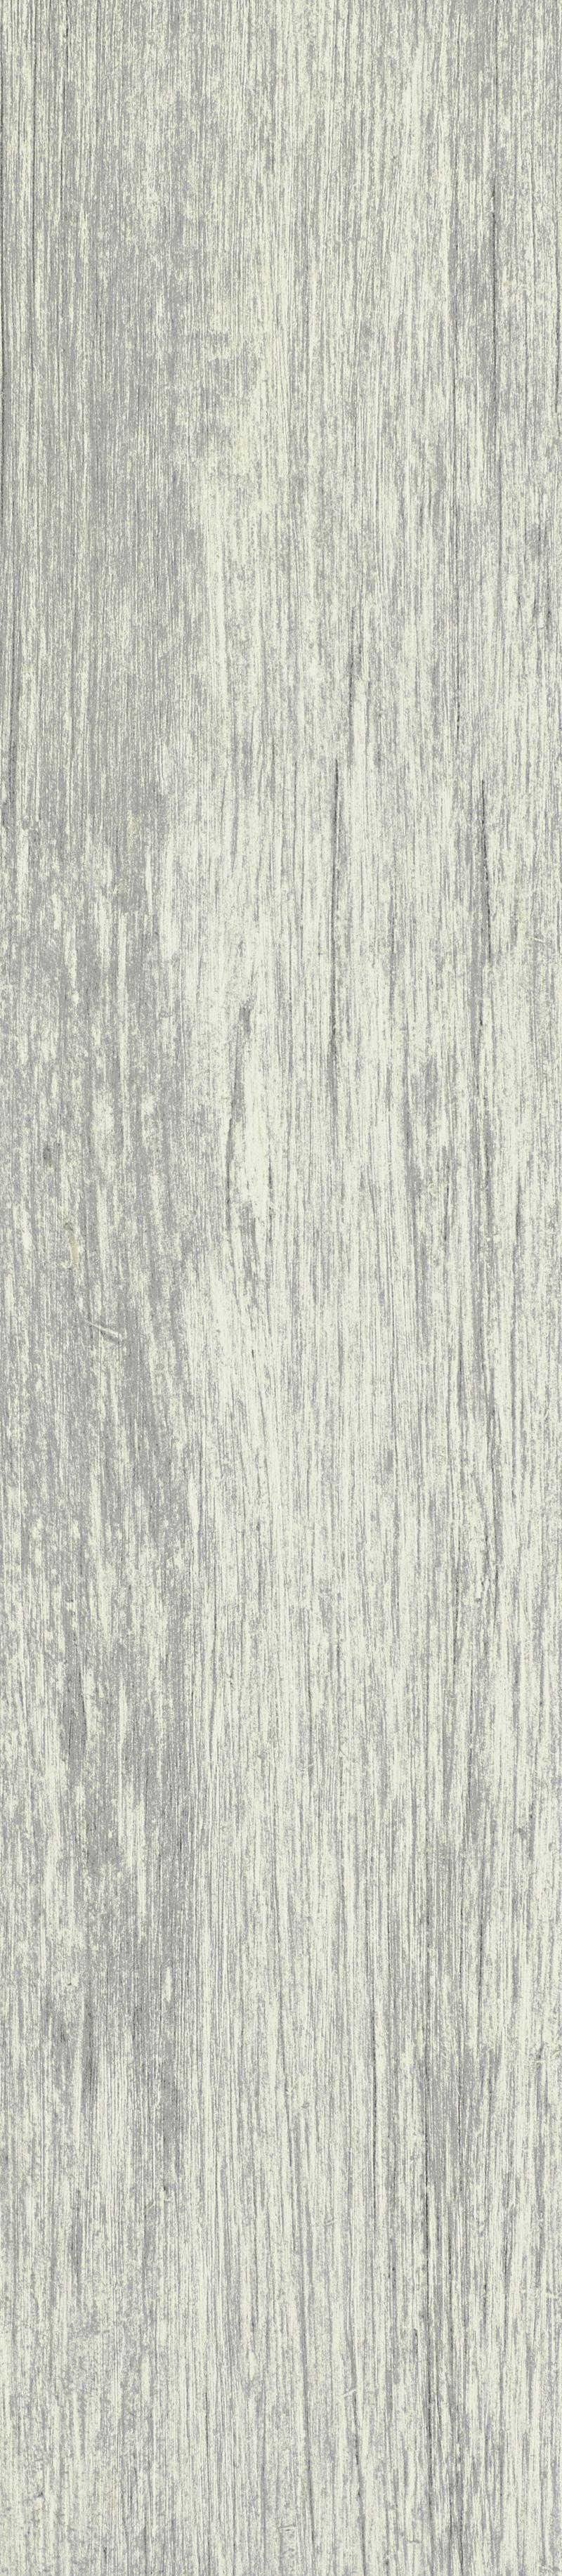 Forester Grey Wood Effect Porcelain Tile 21 5x98 5cm The